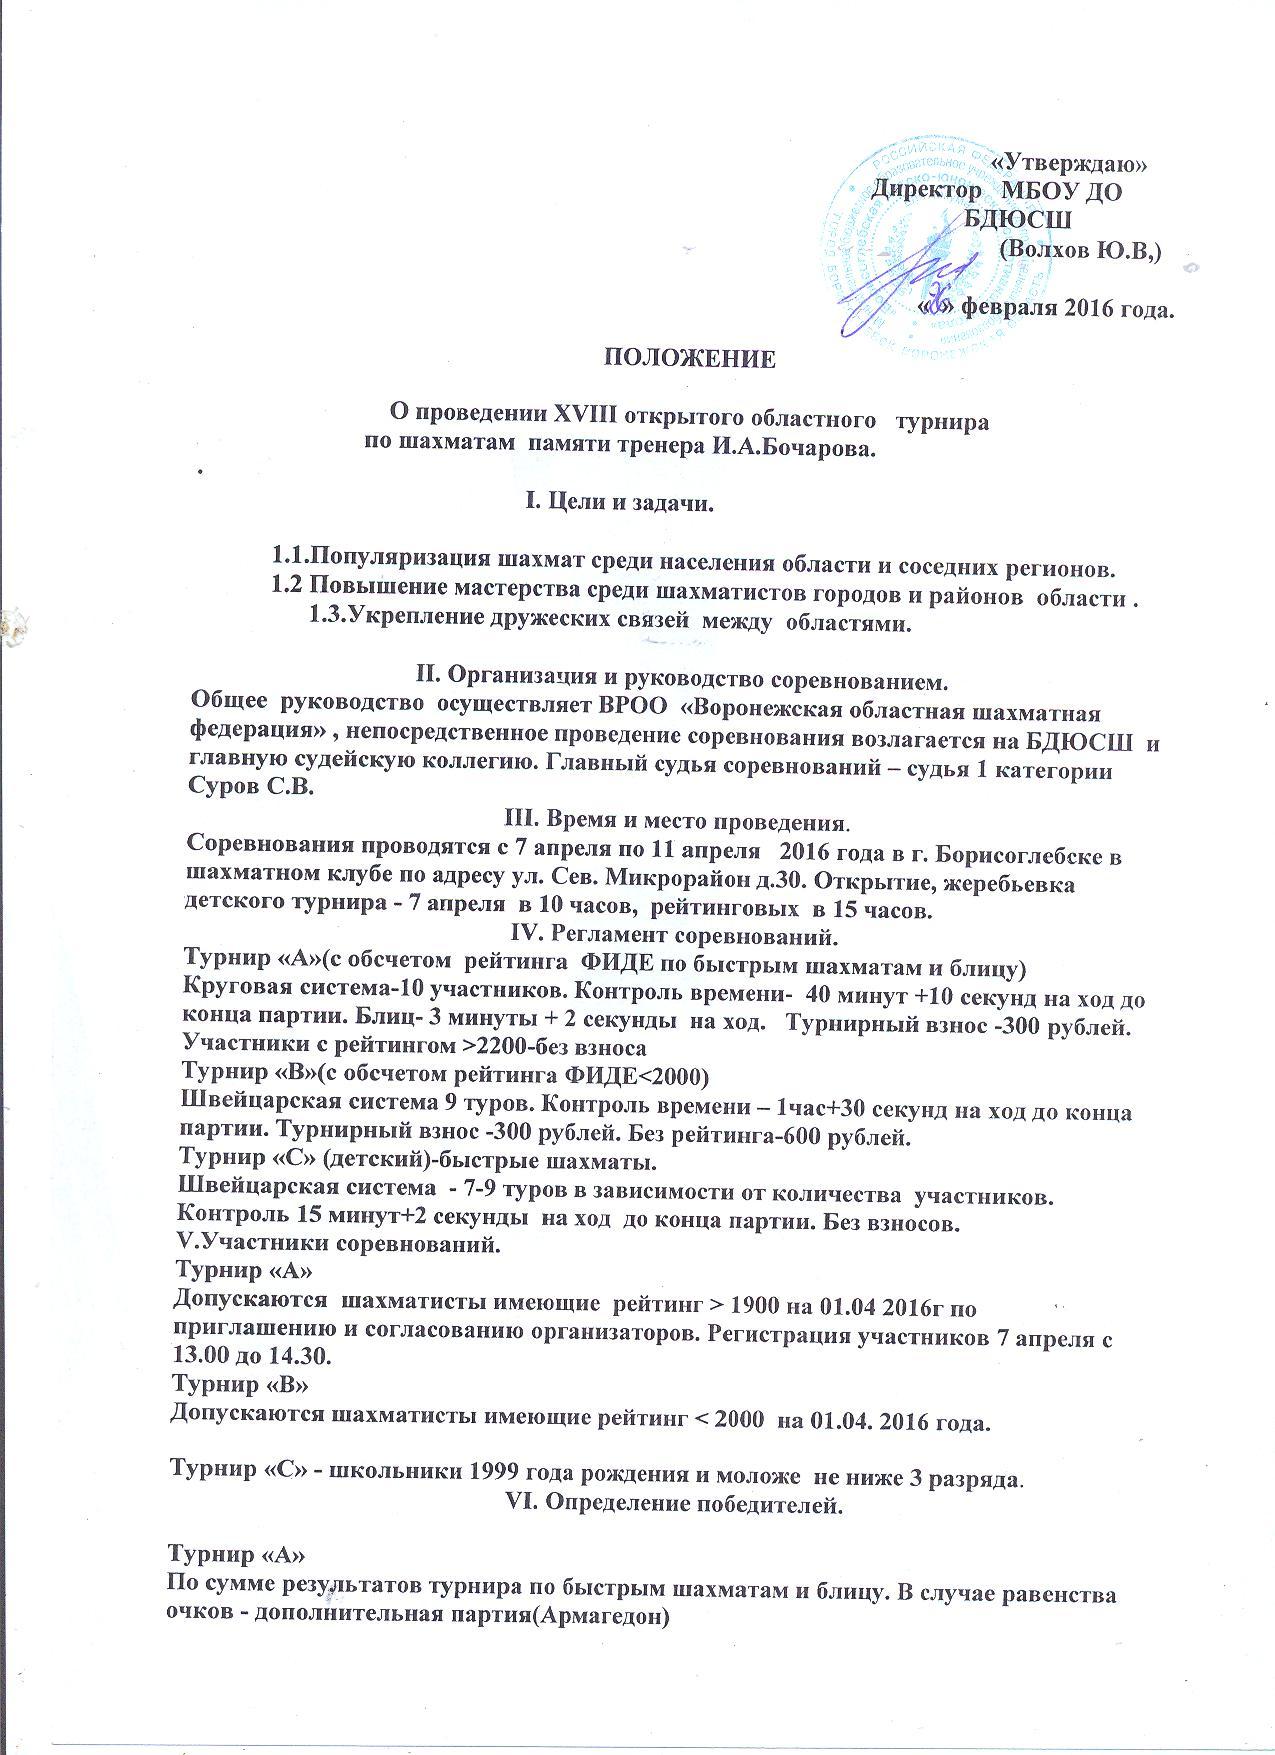 http://s2.uploads.ru/DfIEa.jpg